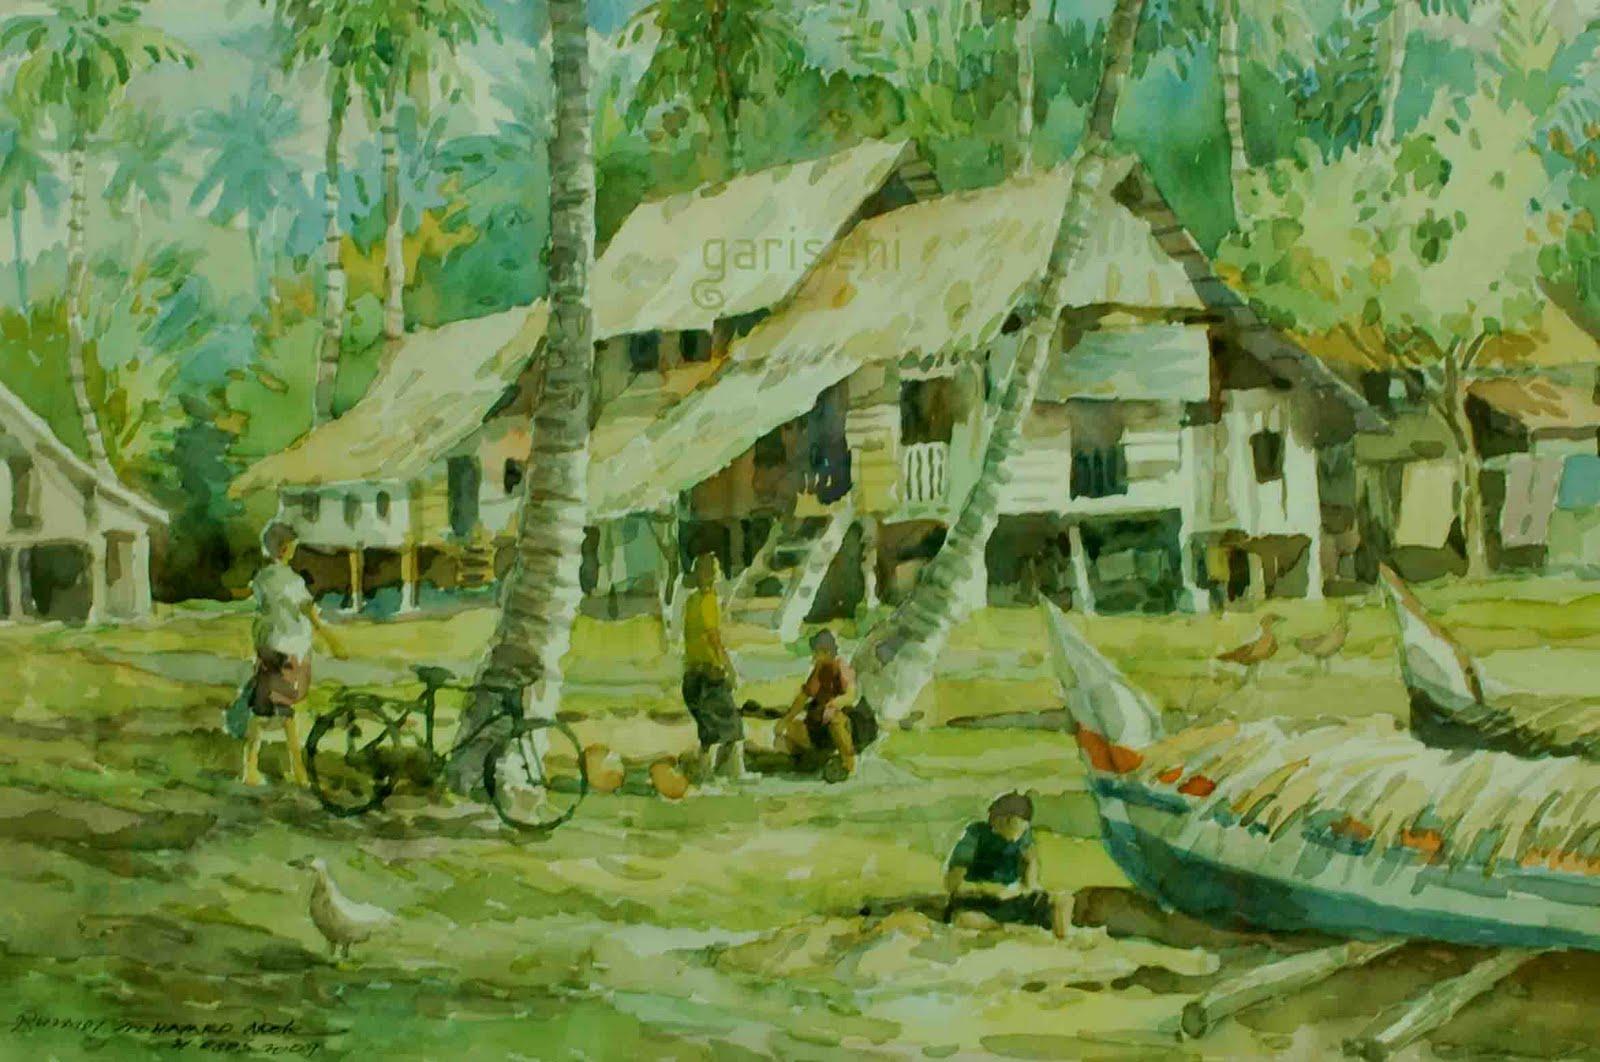 gambar pemandangan kampung - photo #5